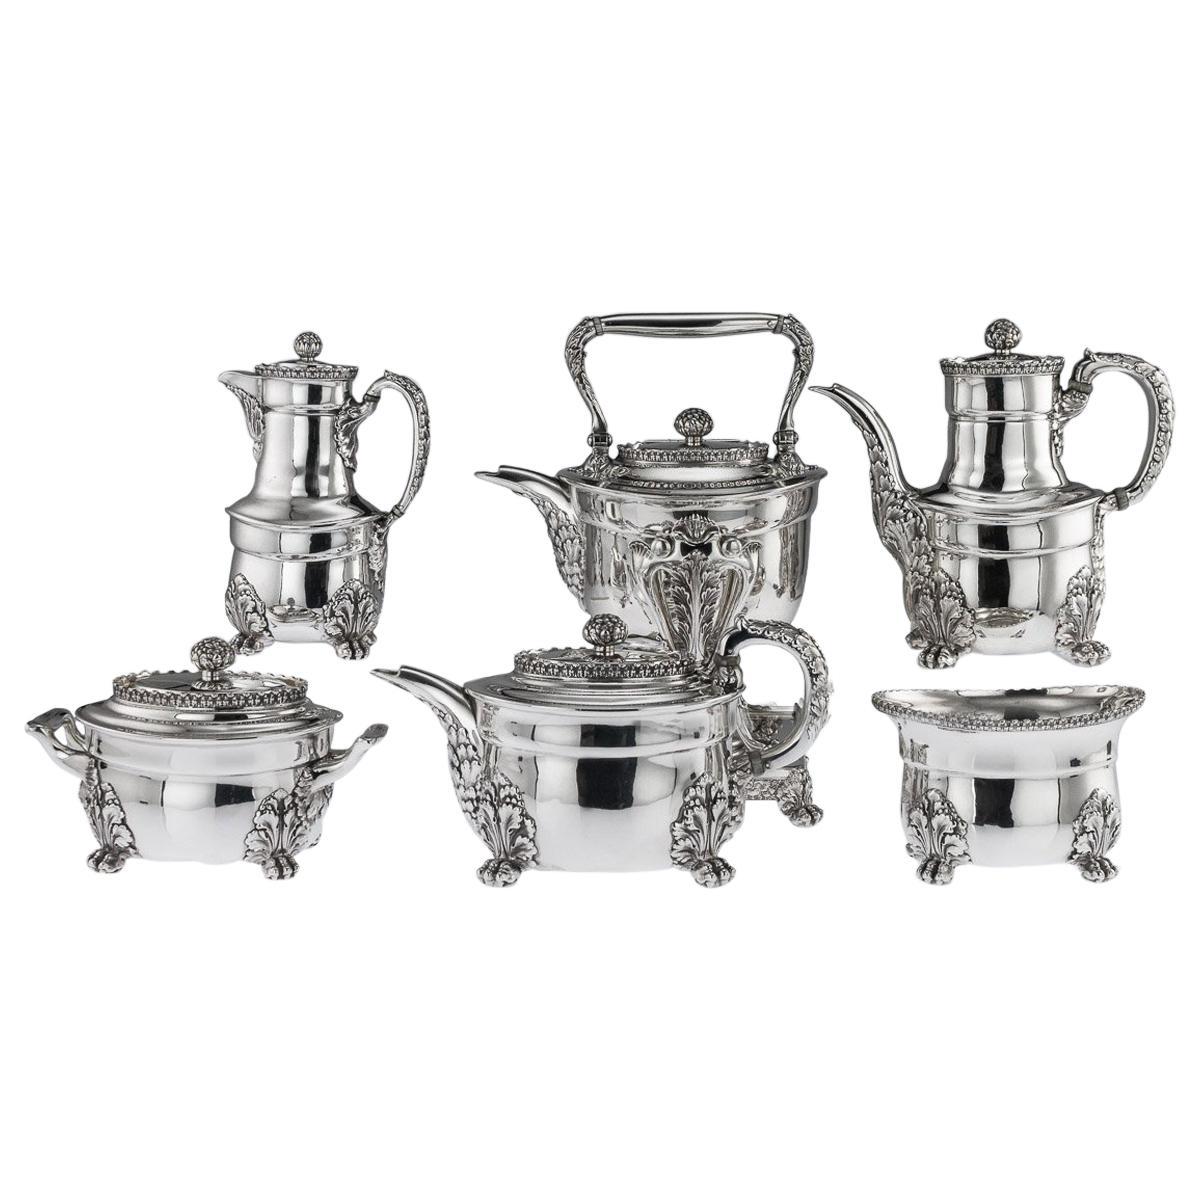 19th Century American Tiffany & Co. Solid Silver Acanthus Tea Service circa 1880